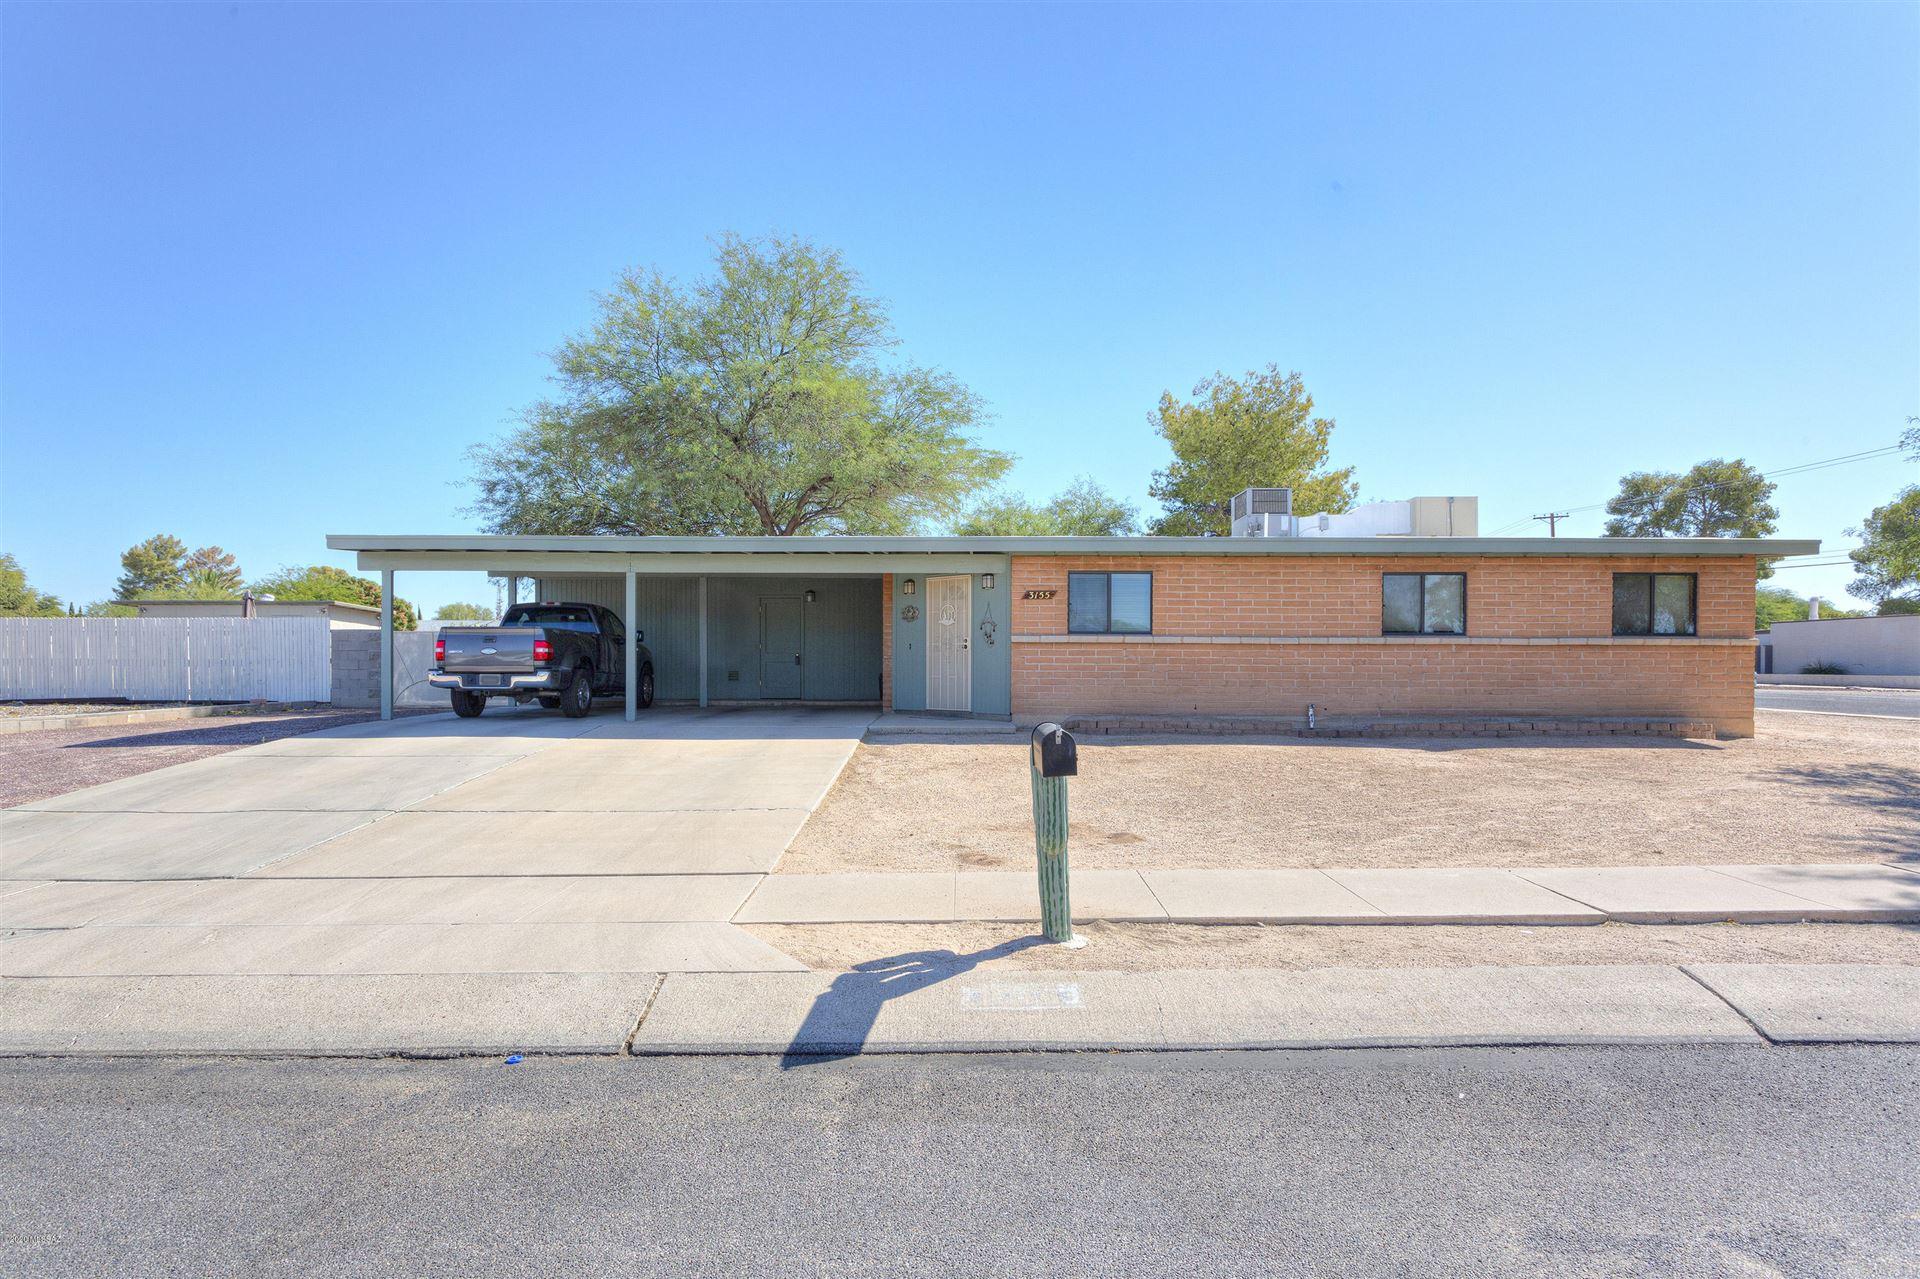 3155 S Marvin Avenue, Tucson, AZ 85730 - MLS#: 22026115